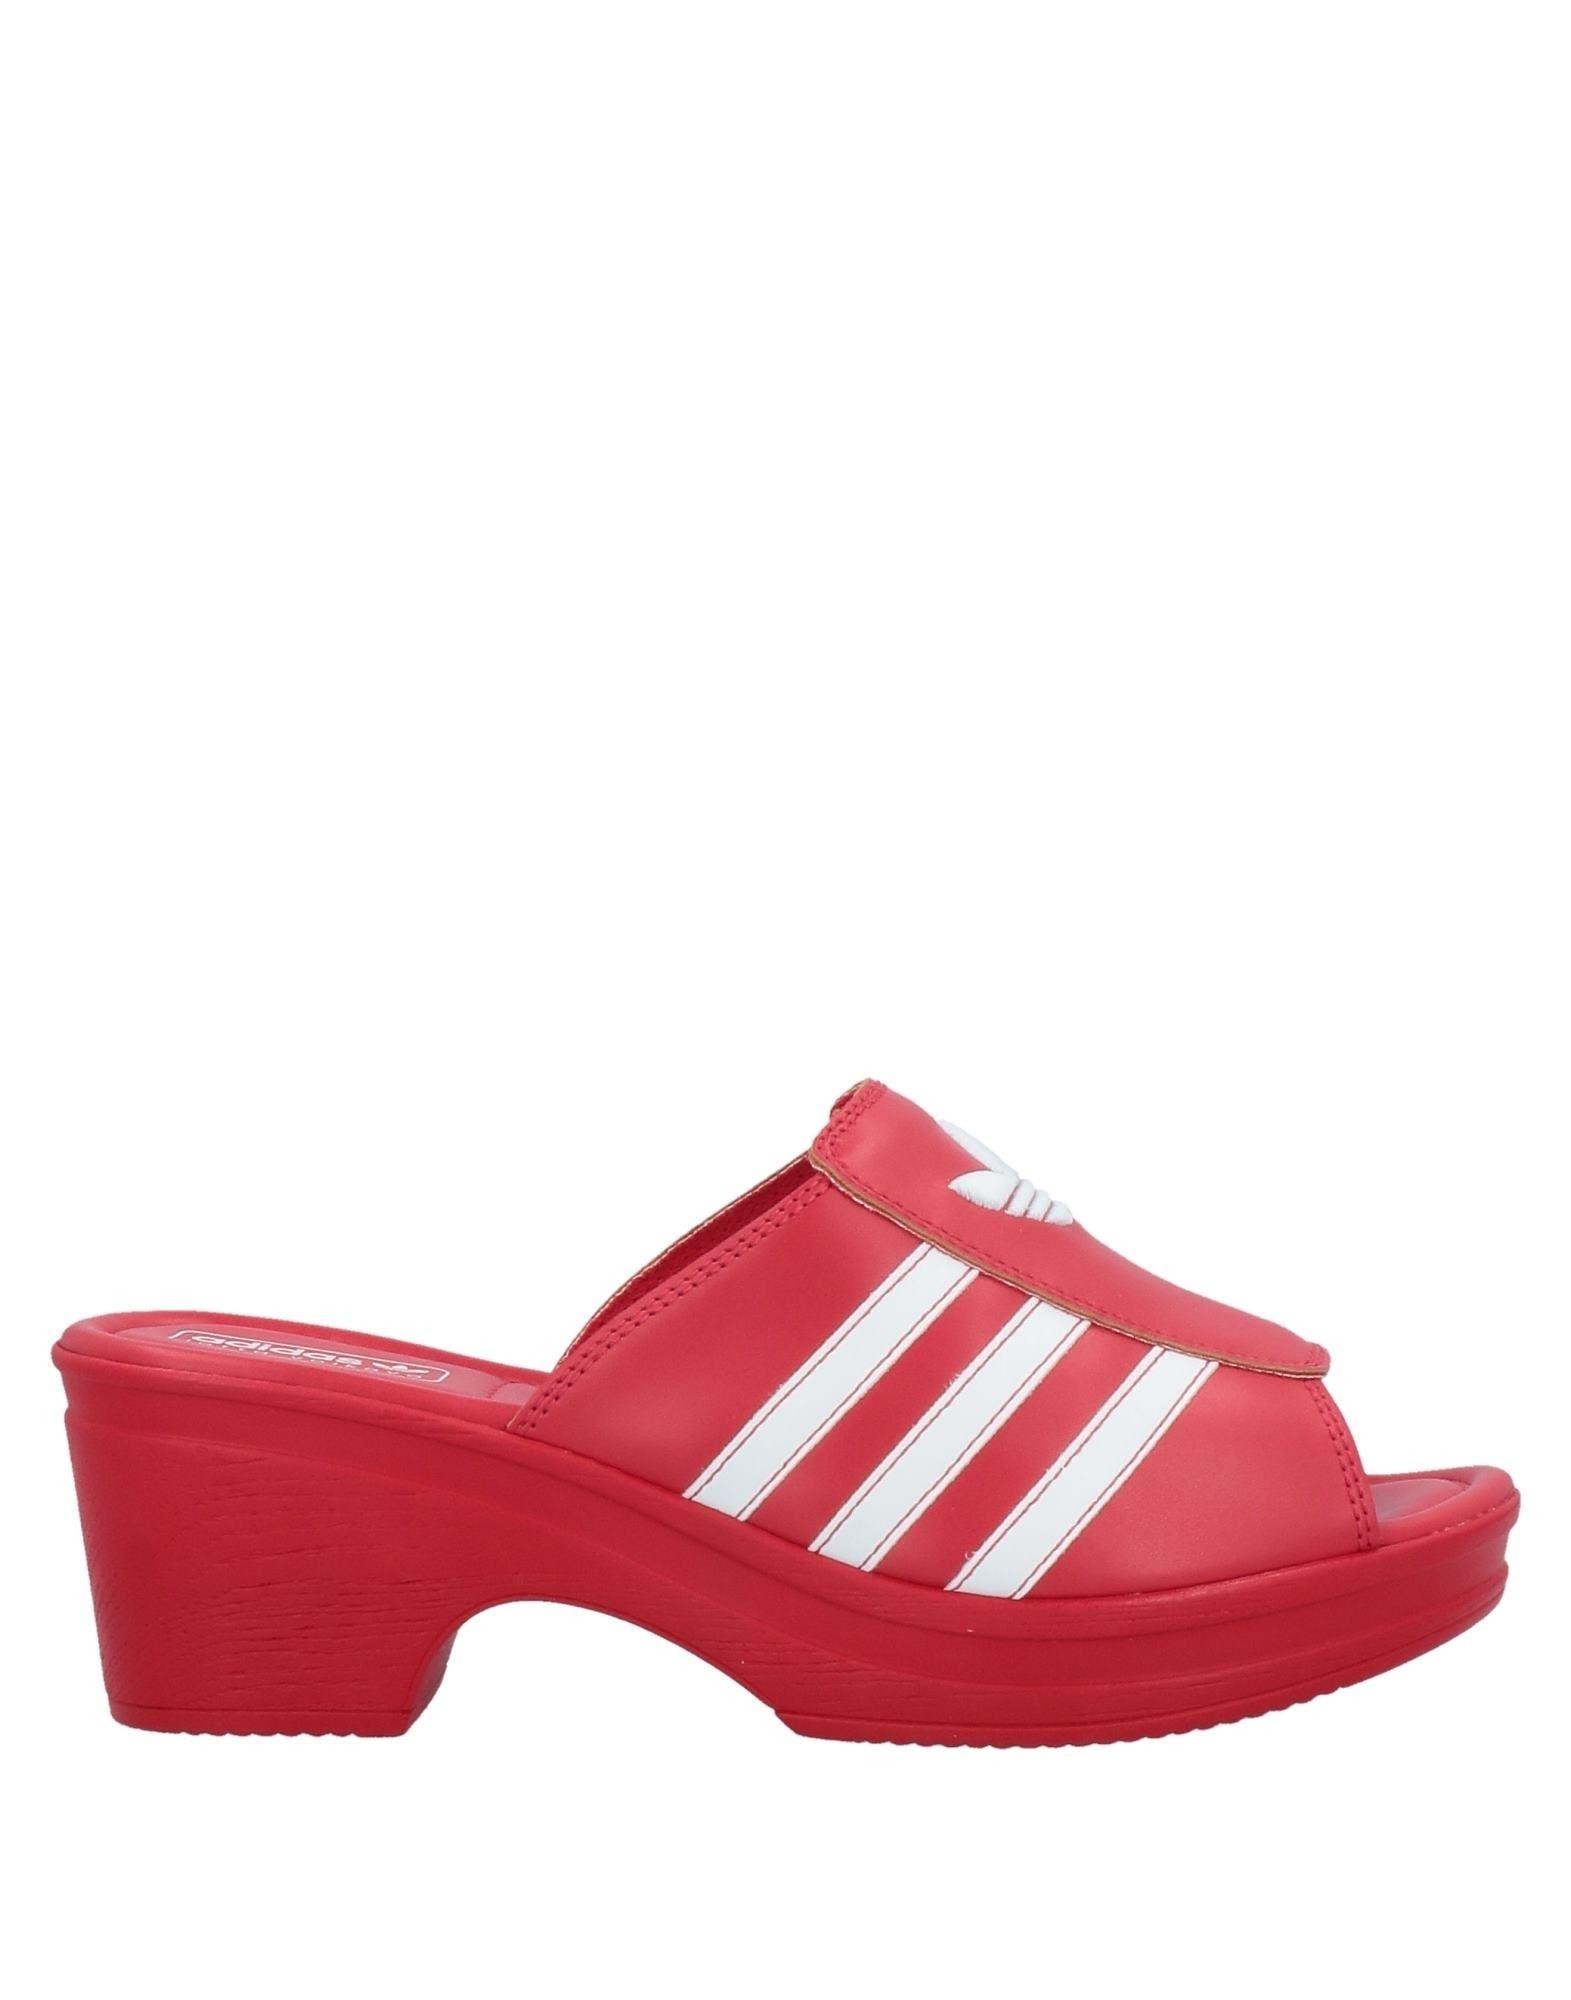 Adidas Originals X Lotta Volkova Sandals In Red